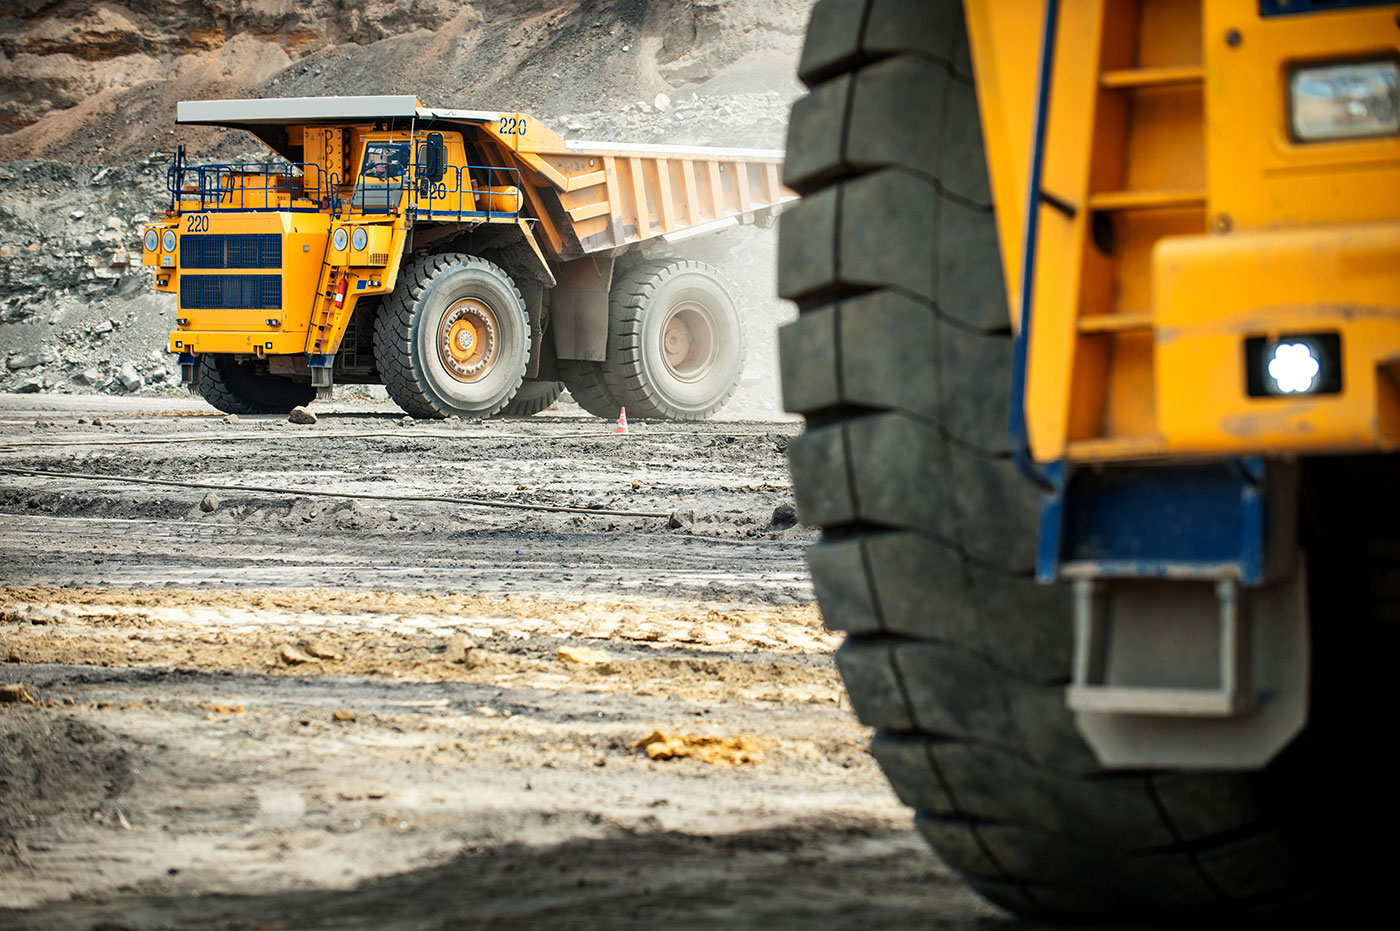 Acme OEM Mining | Two large yellow mining trucks onsite